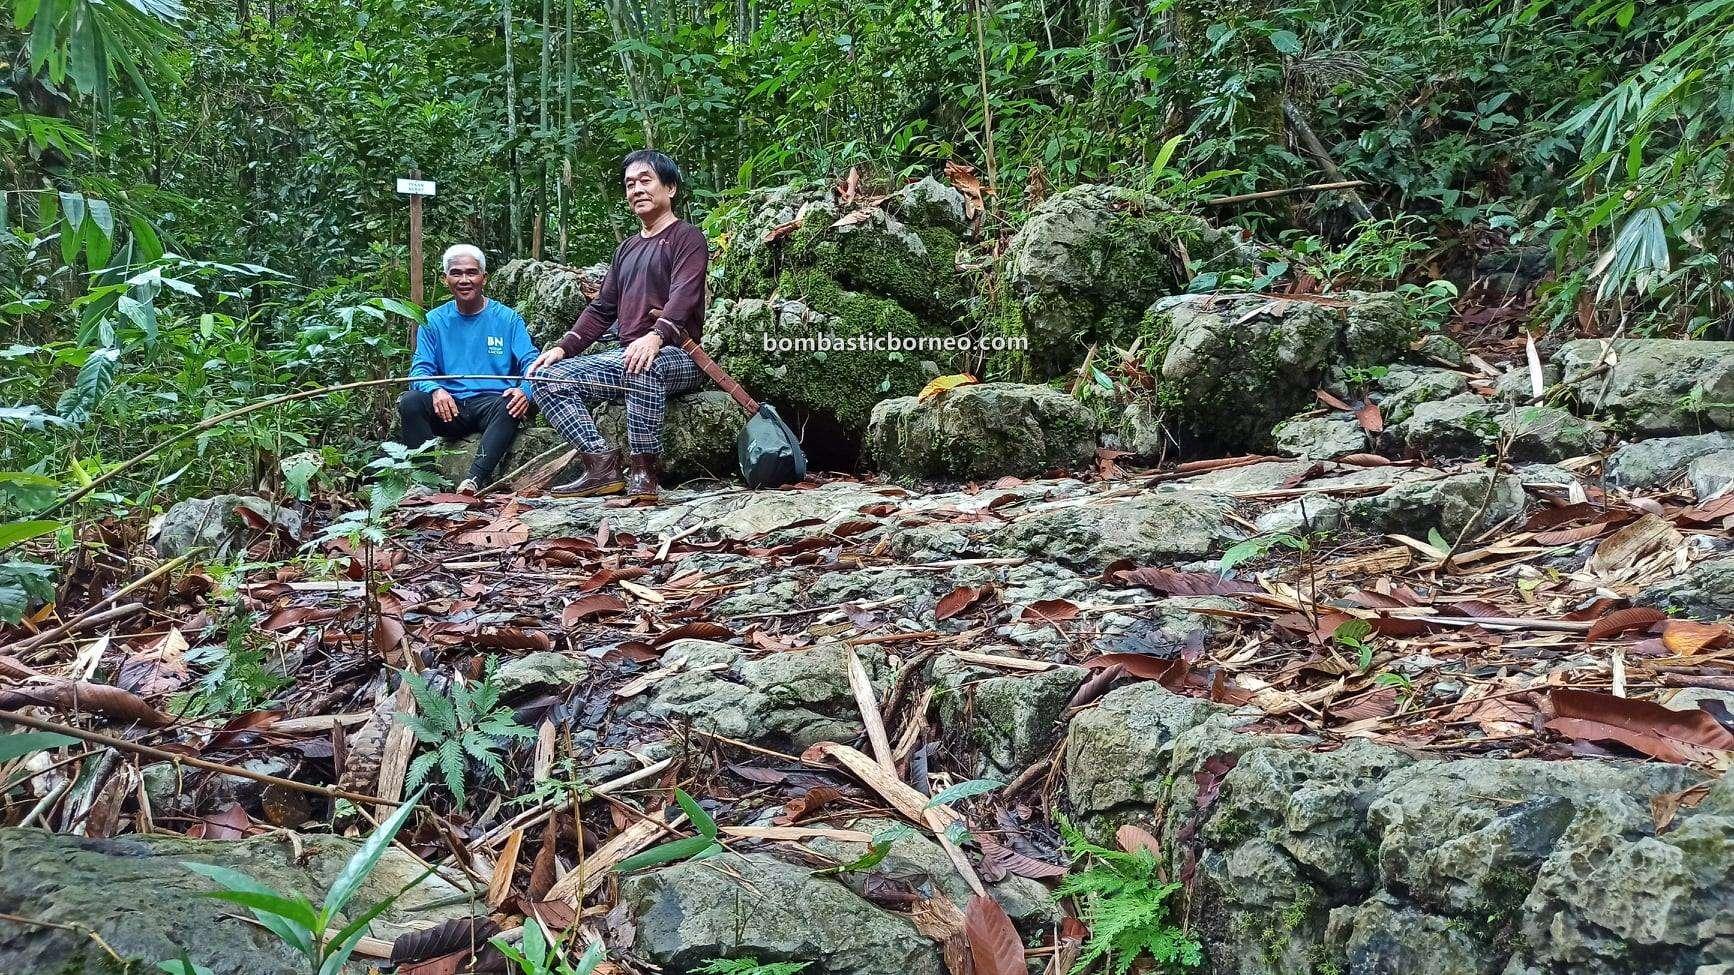 Bung Mawang, Kampung Serumah, Kampung Gayu, nature, trekking, hiking, exploration, Kuching, Sarawak, Malaysia, backpackers, Tourism, tourist attraction, travel guide, Trans Borneo